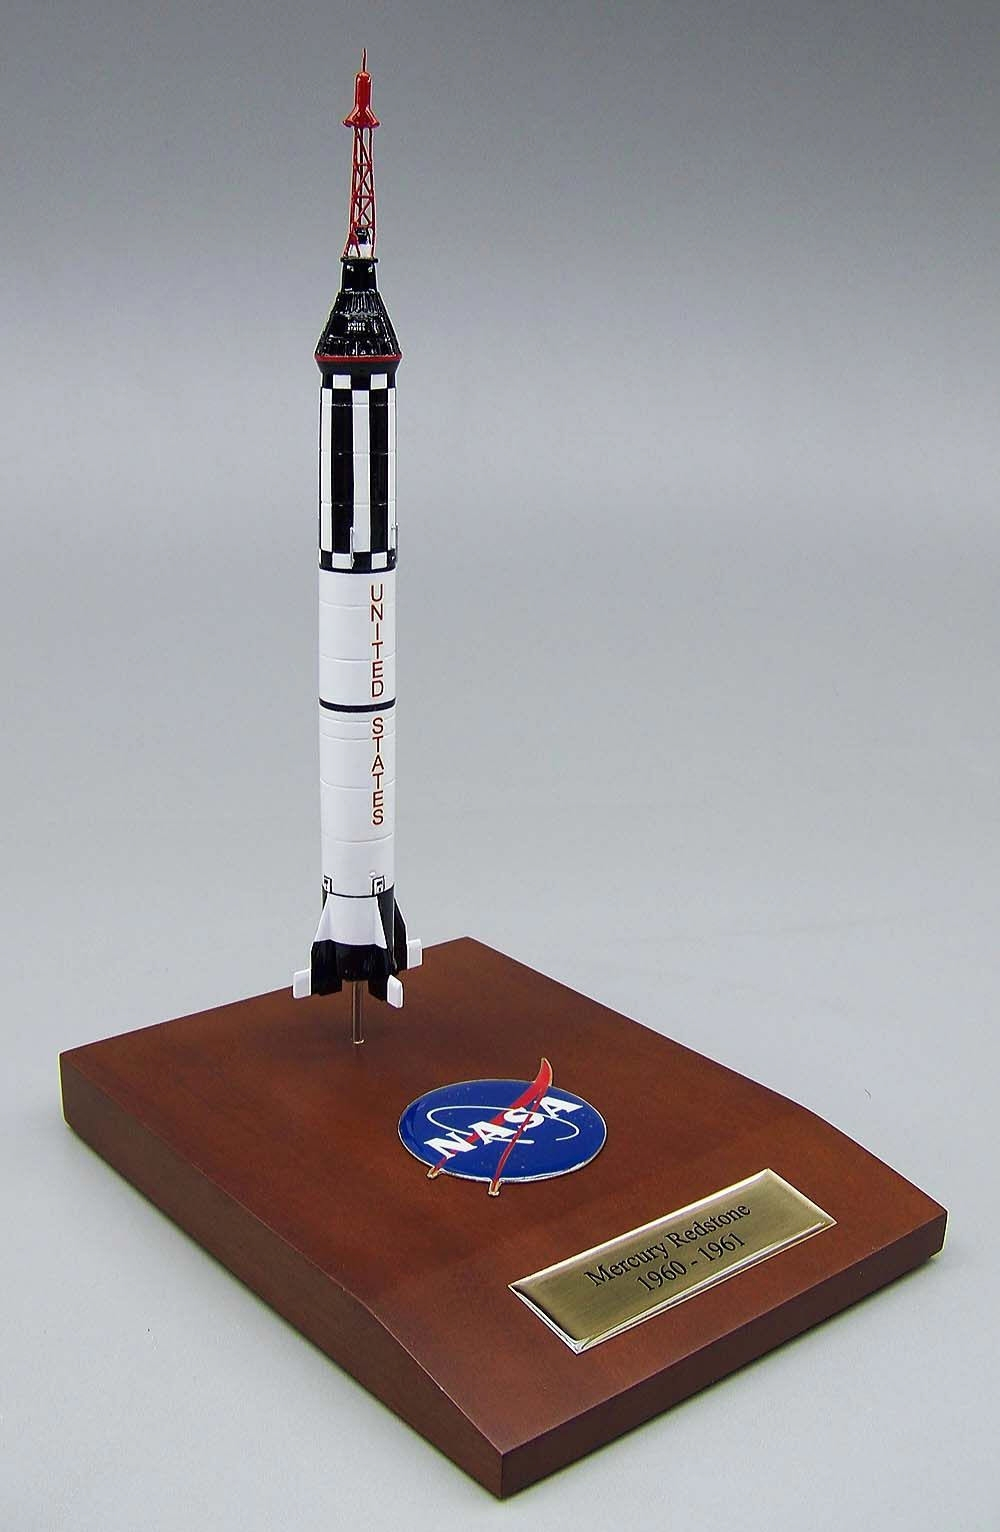 nasa redstone rocket model - photo #3